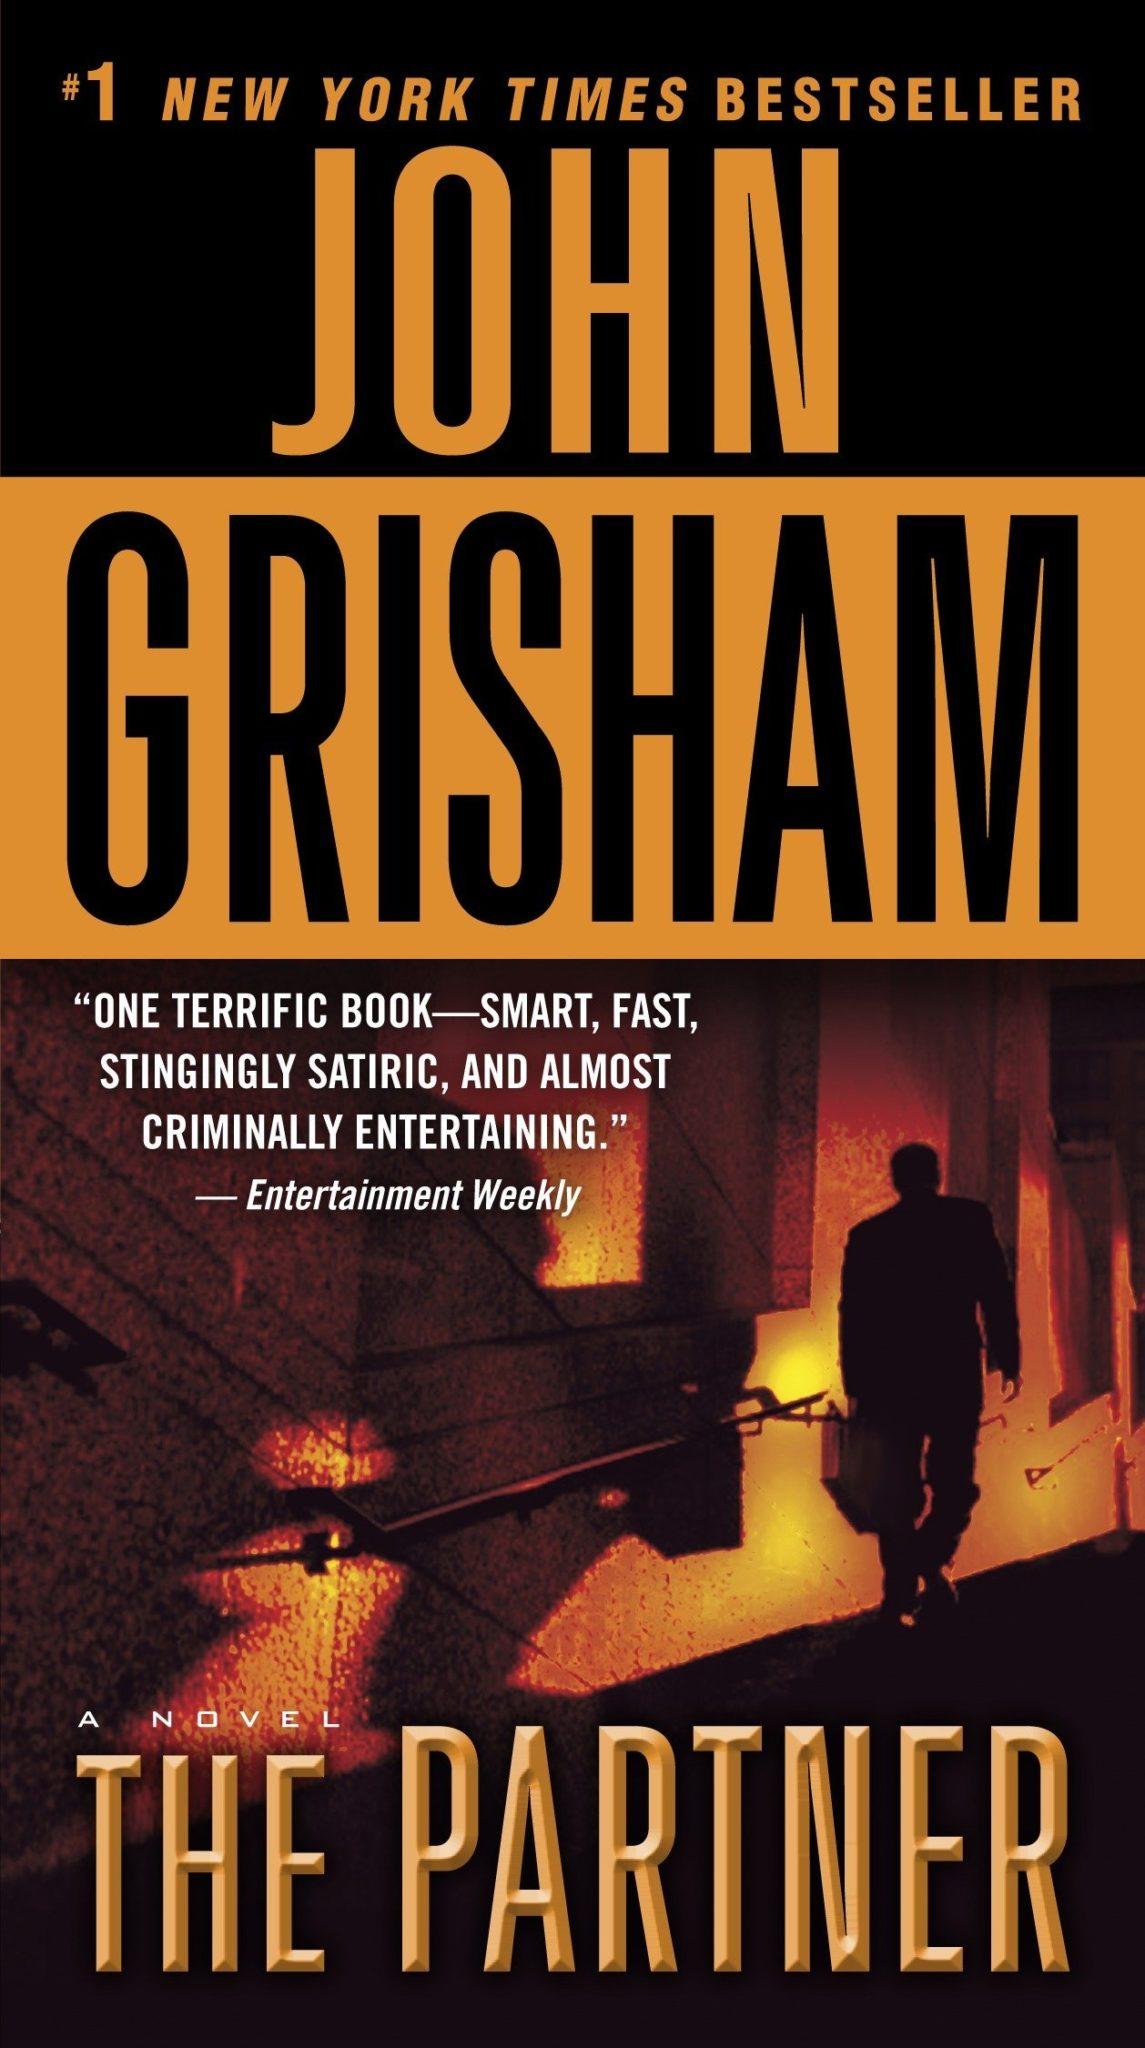 John Grisham books 10